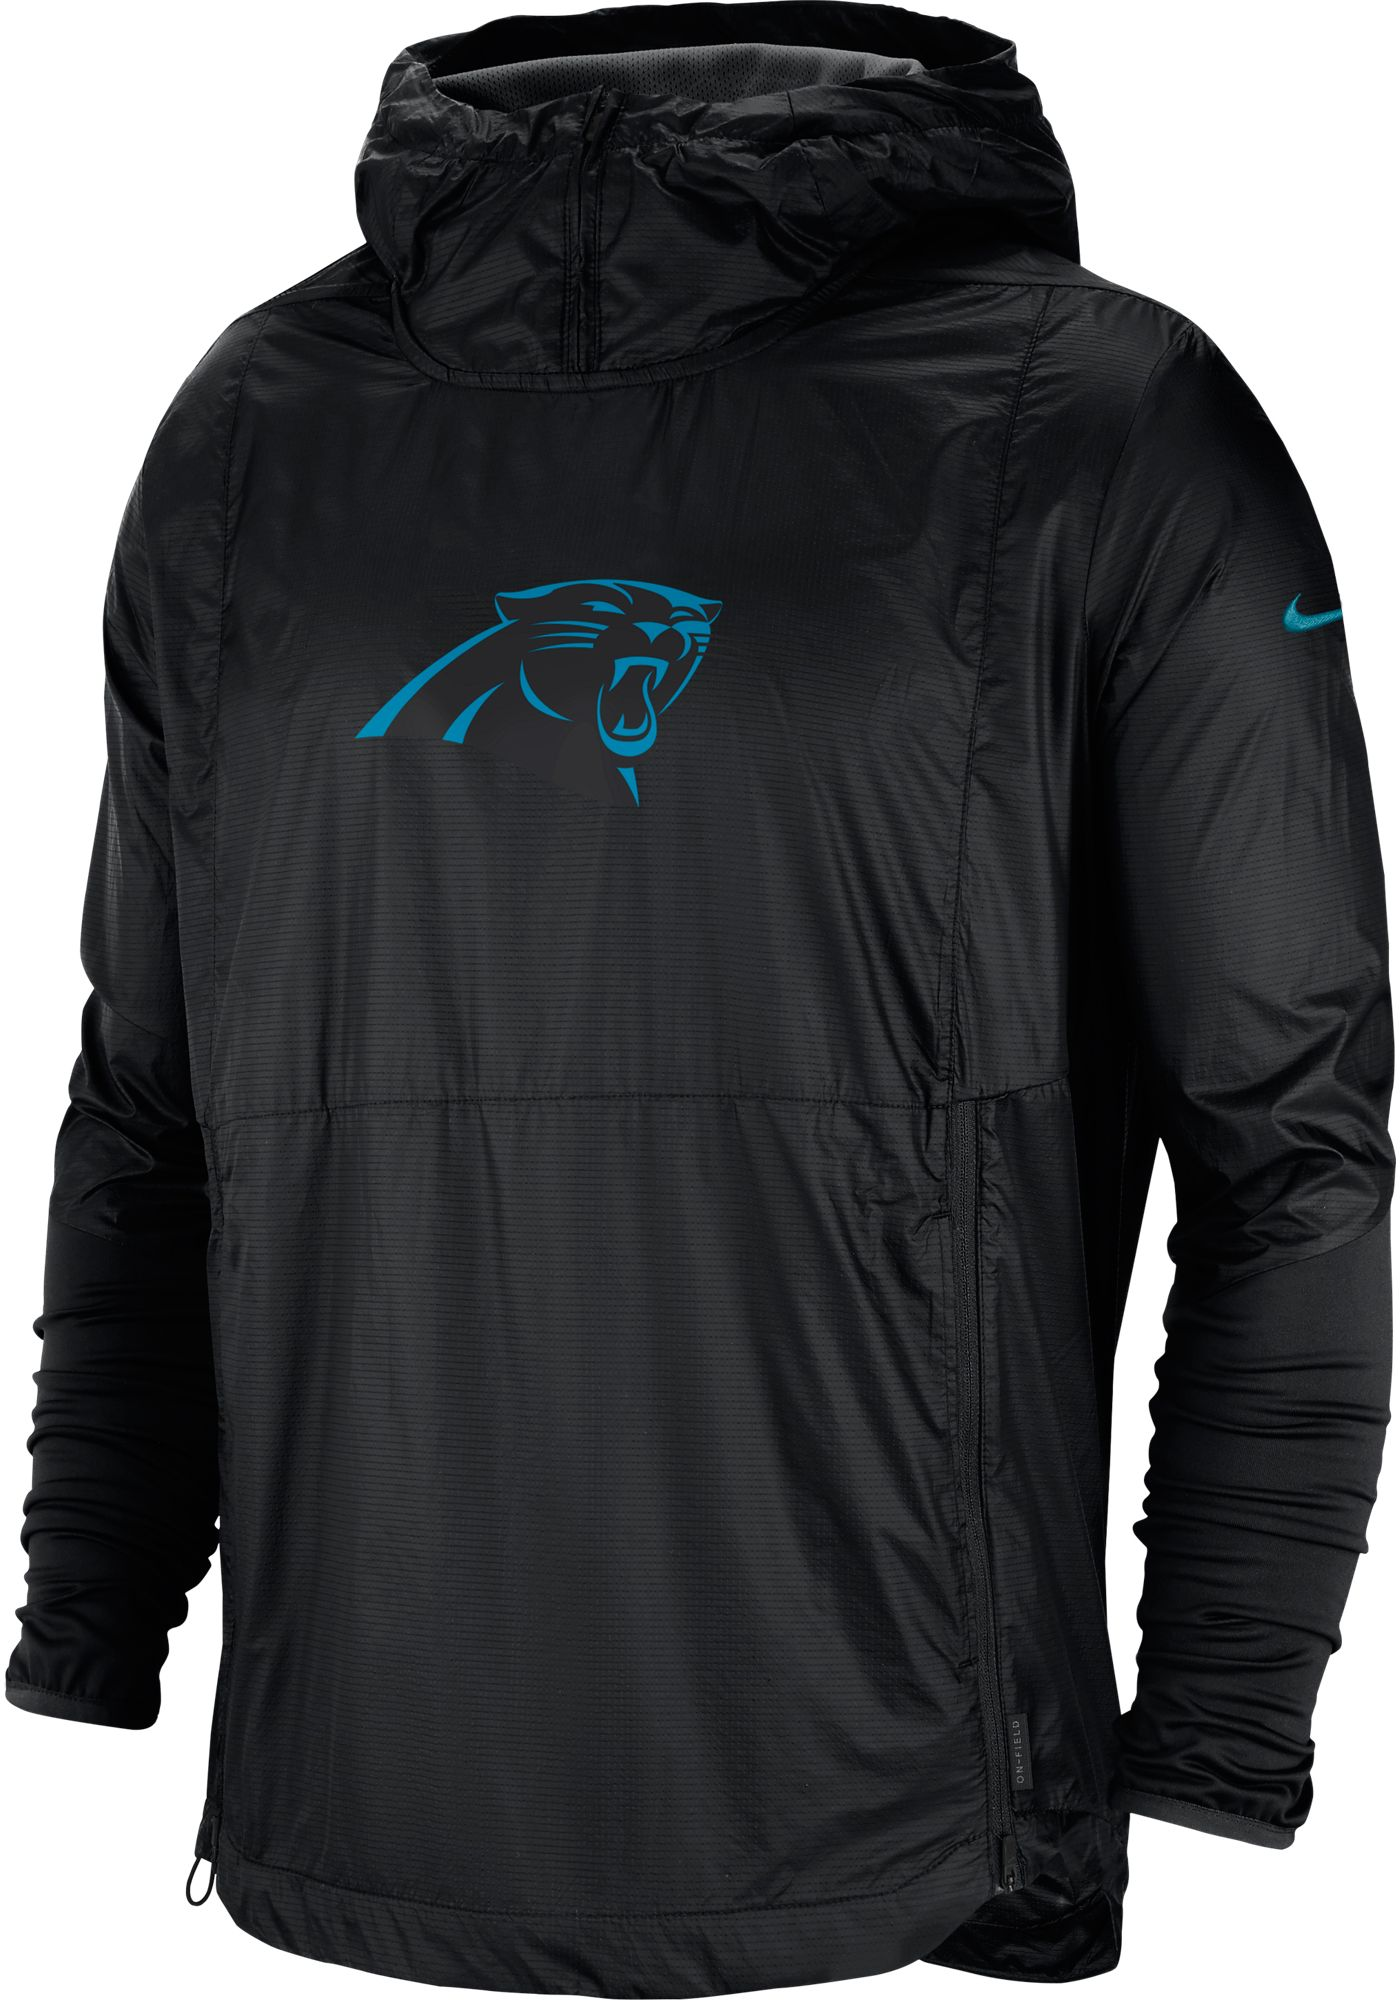 Nike Men's Carolina Panthers Sideline Repel Player Black Jacket